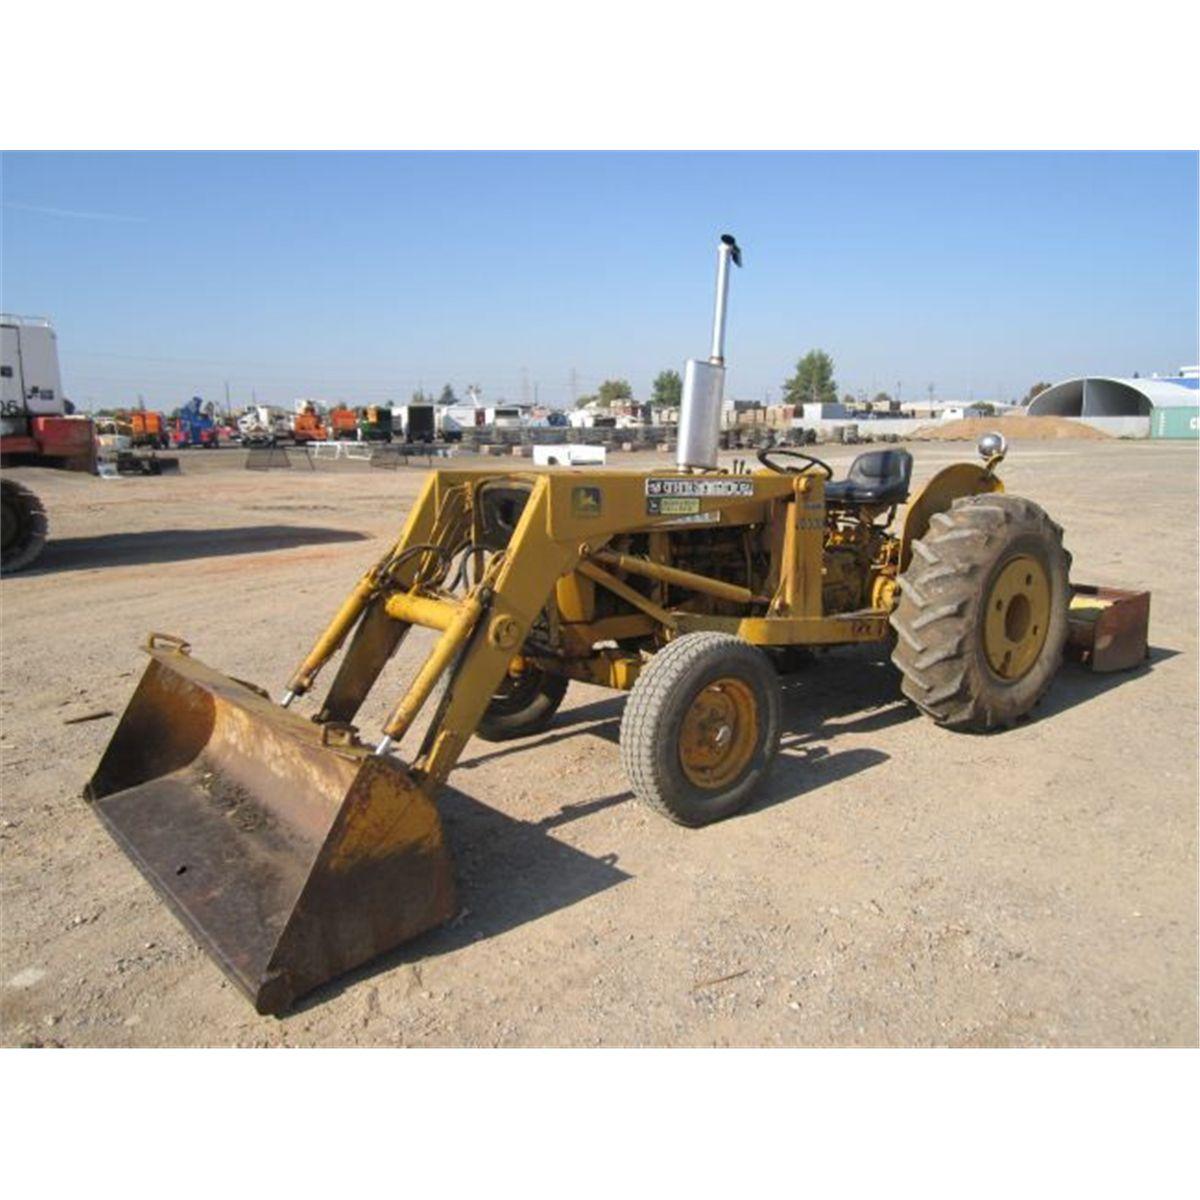 John Deere JD-300 Ag. Tractor